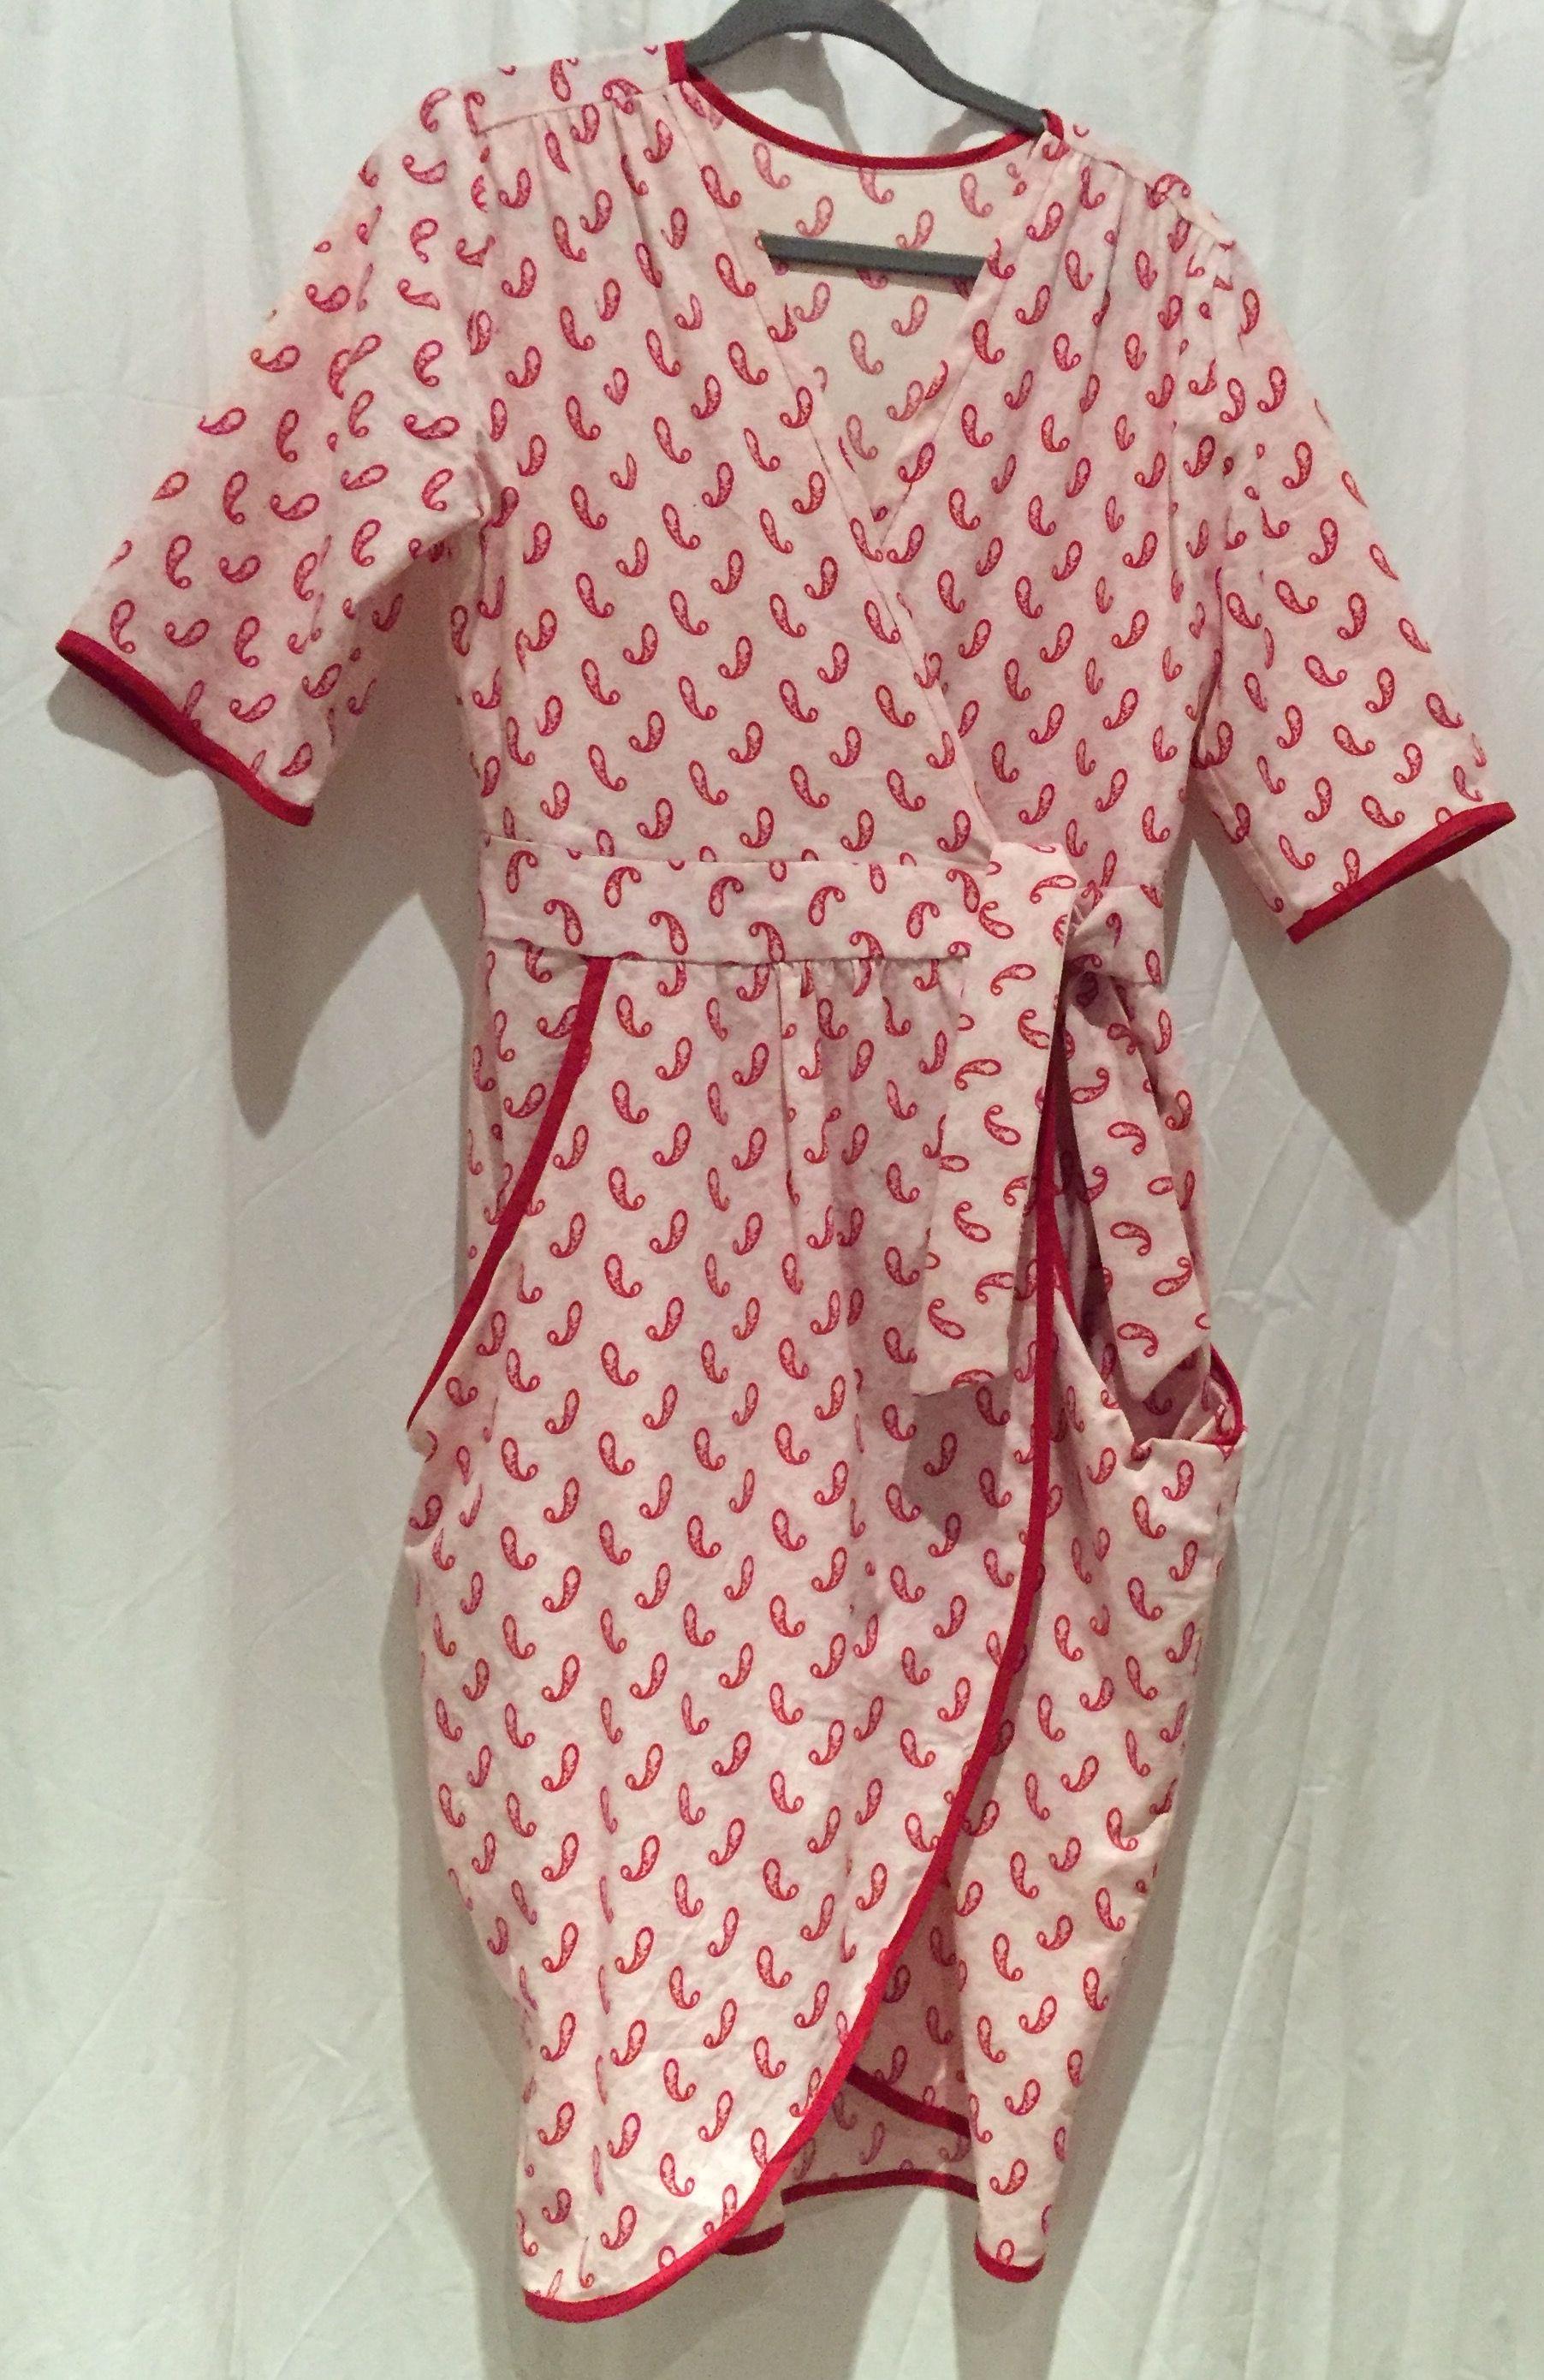 Schnittmuster Kleid Sally [Digital] | Schnittmuster kleid ...